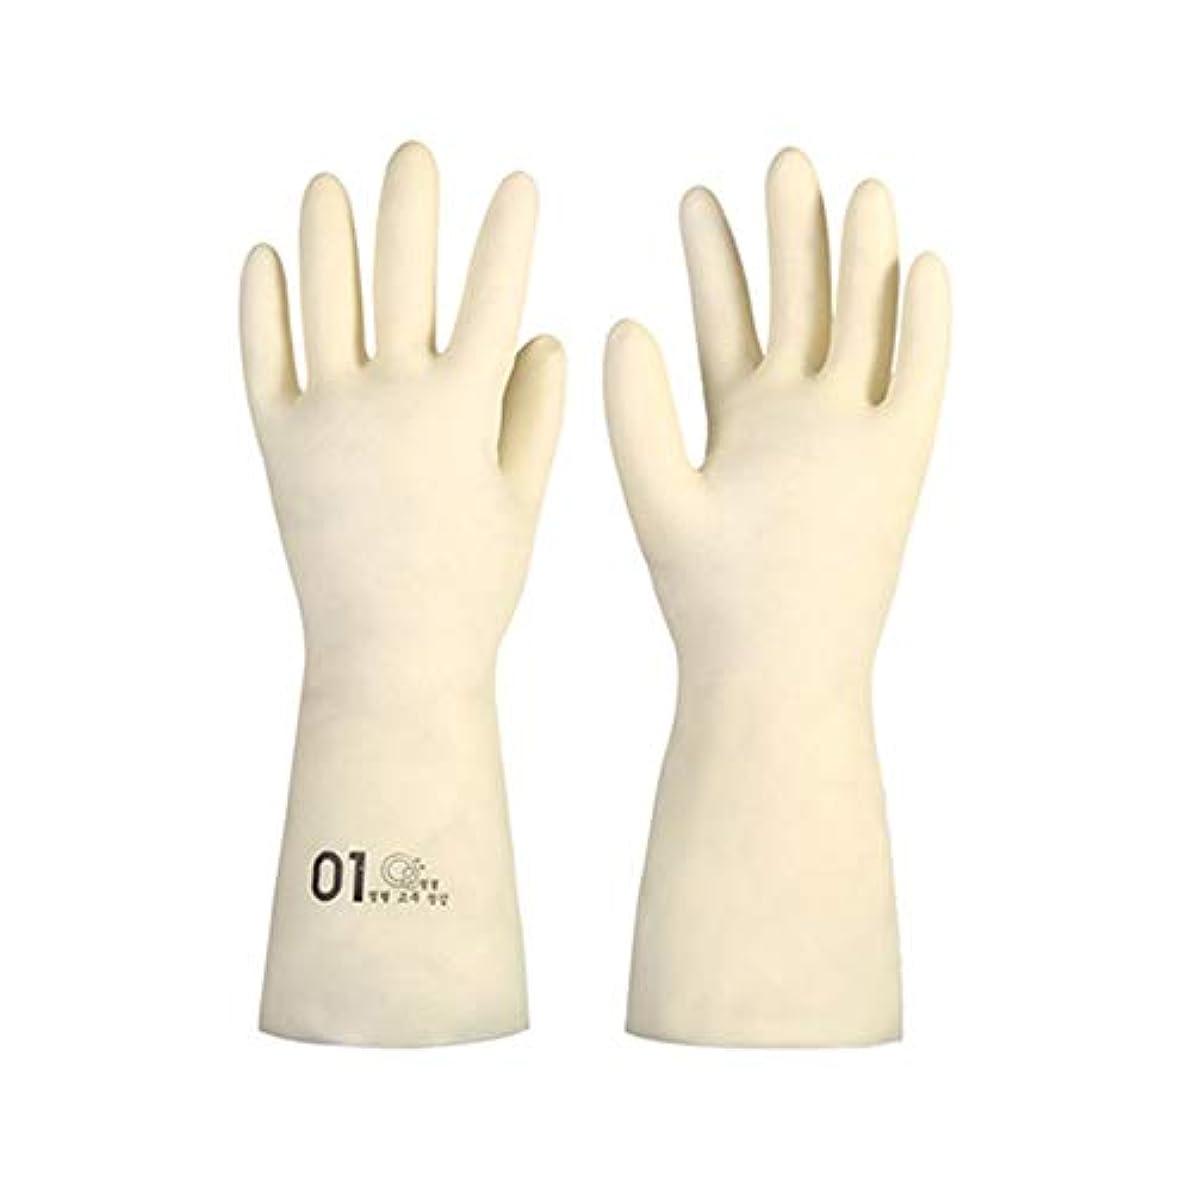 偏心展望台弁護人BTXXYJP キッチン用手袋 手袋 掃除用 ロング 耐摩耗 食器洗い 手袋 水槽掃除用手袋 (Color : M/1号, Size : M)